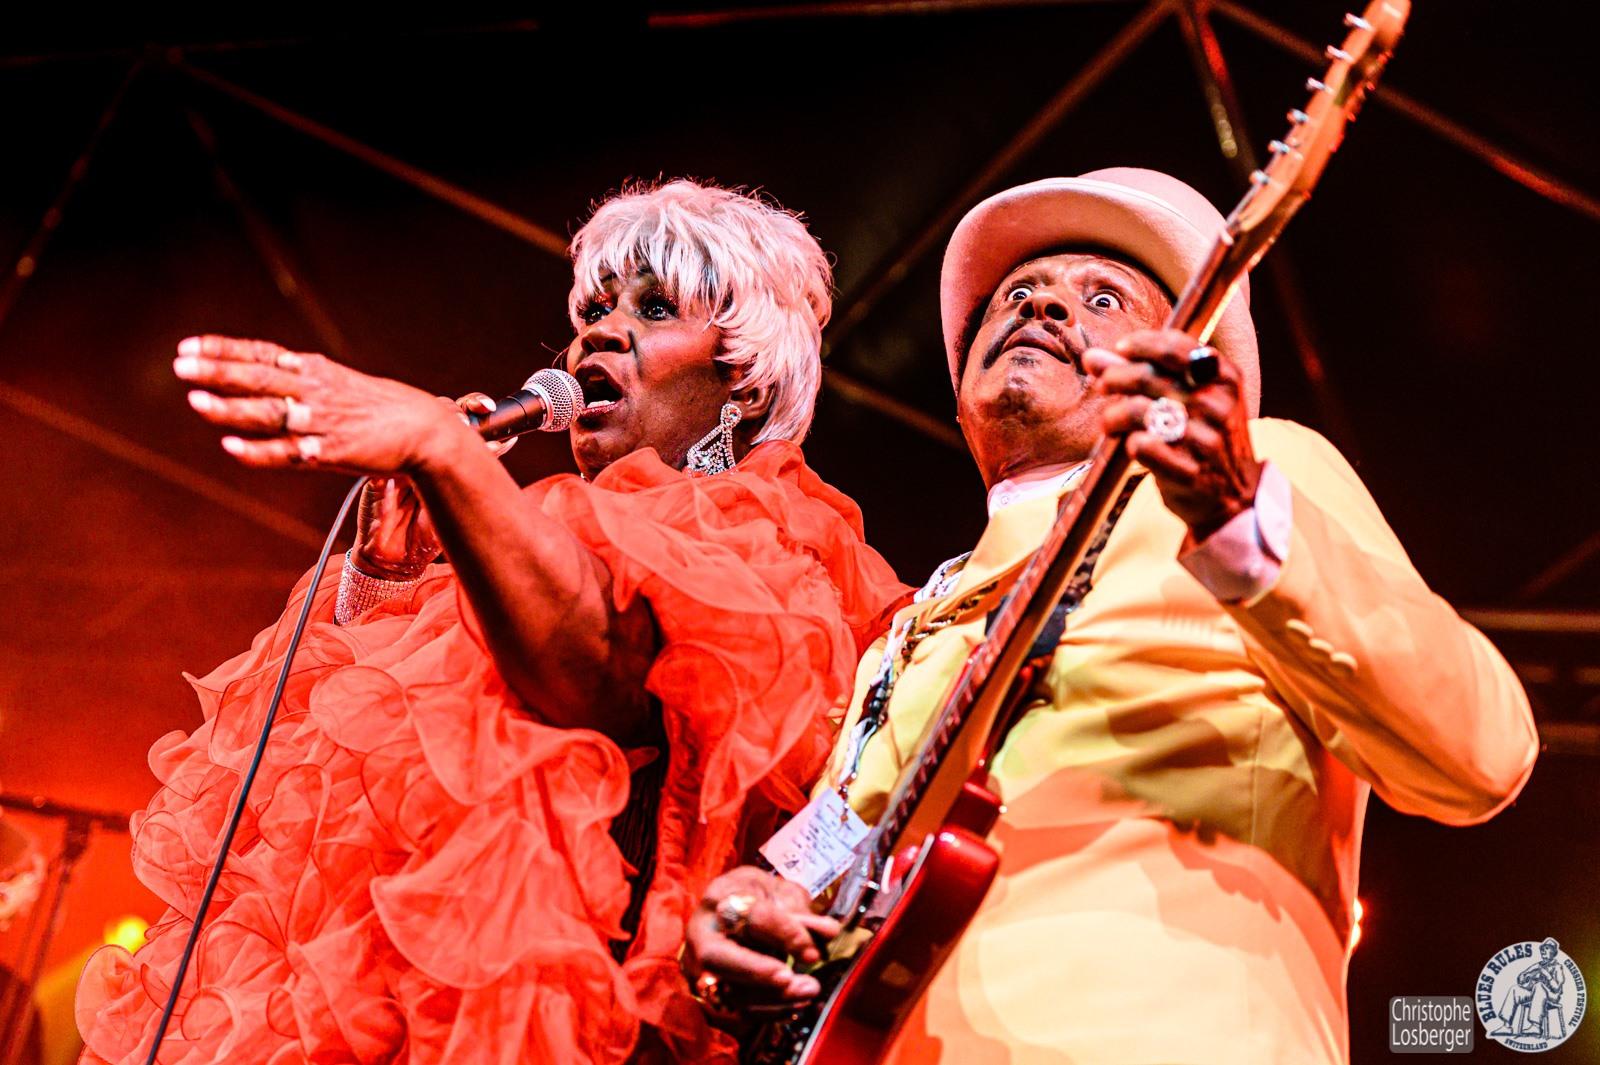 johnie b & queen iretta sanders blues band revue blues rules 2019